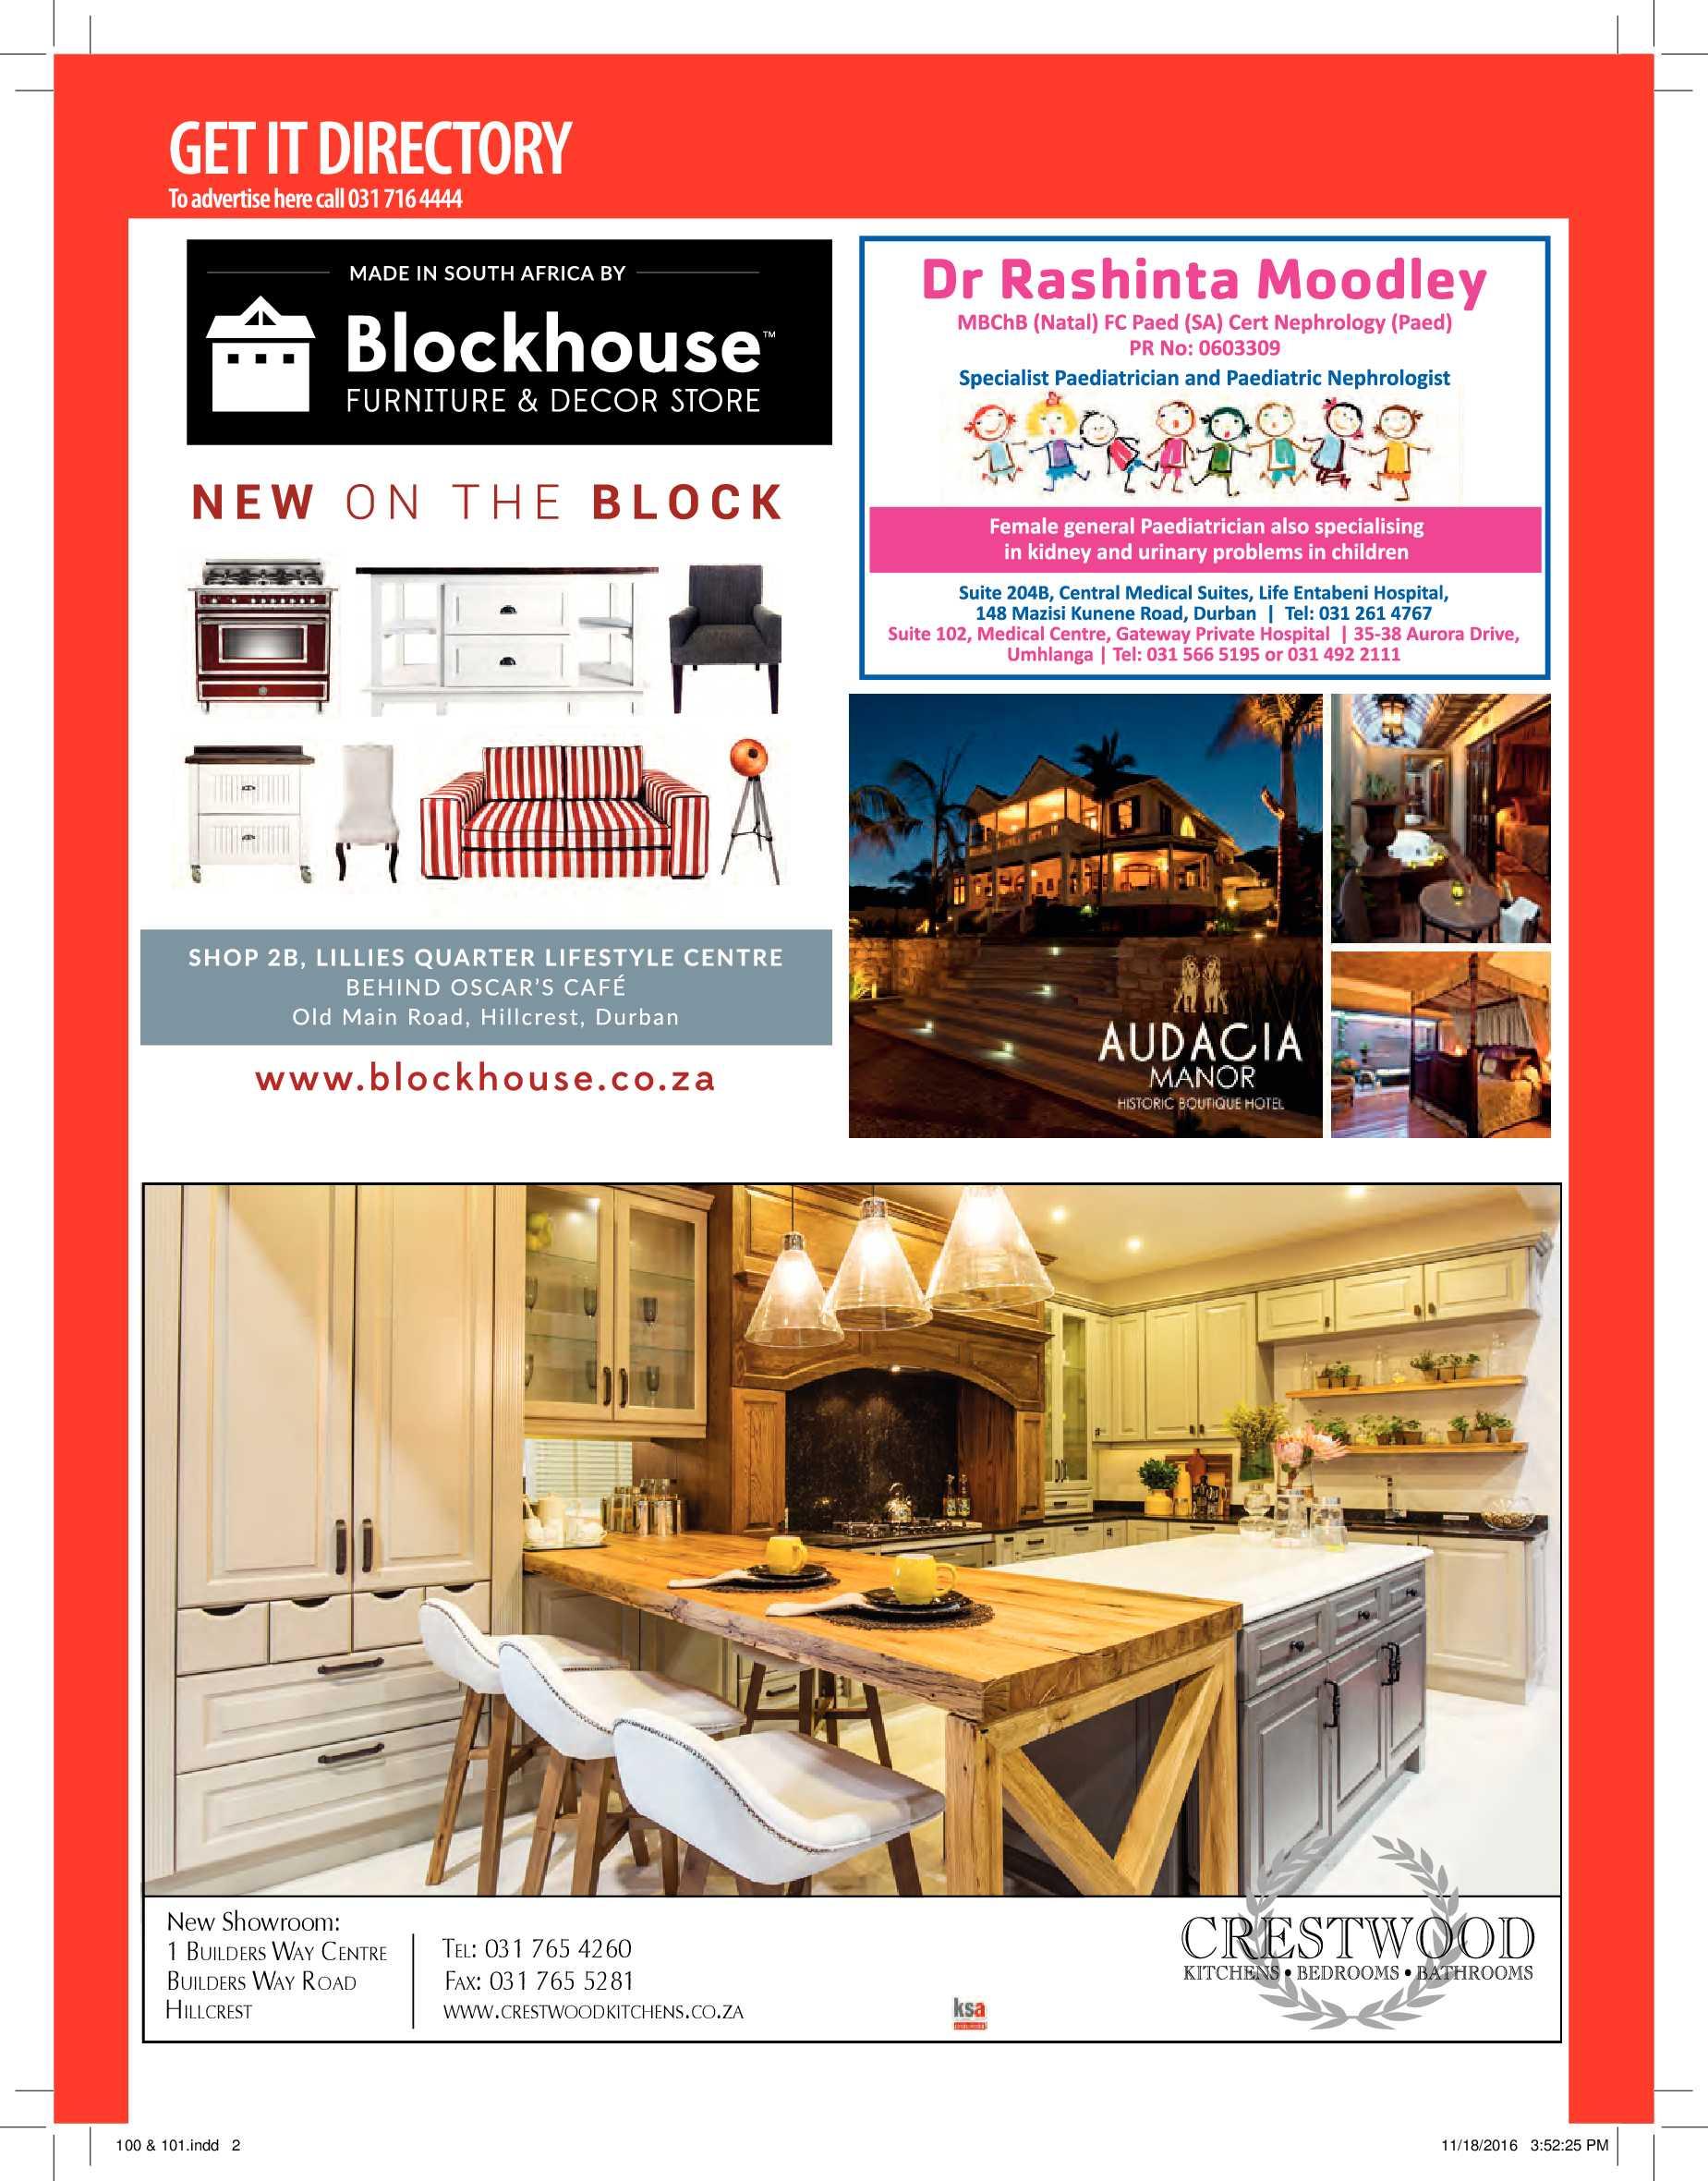 durban-get-it-magazine-december-2016-epapers-page-102